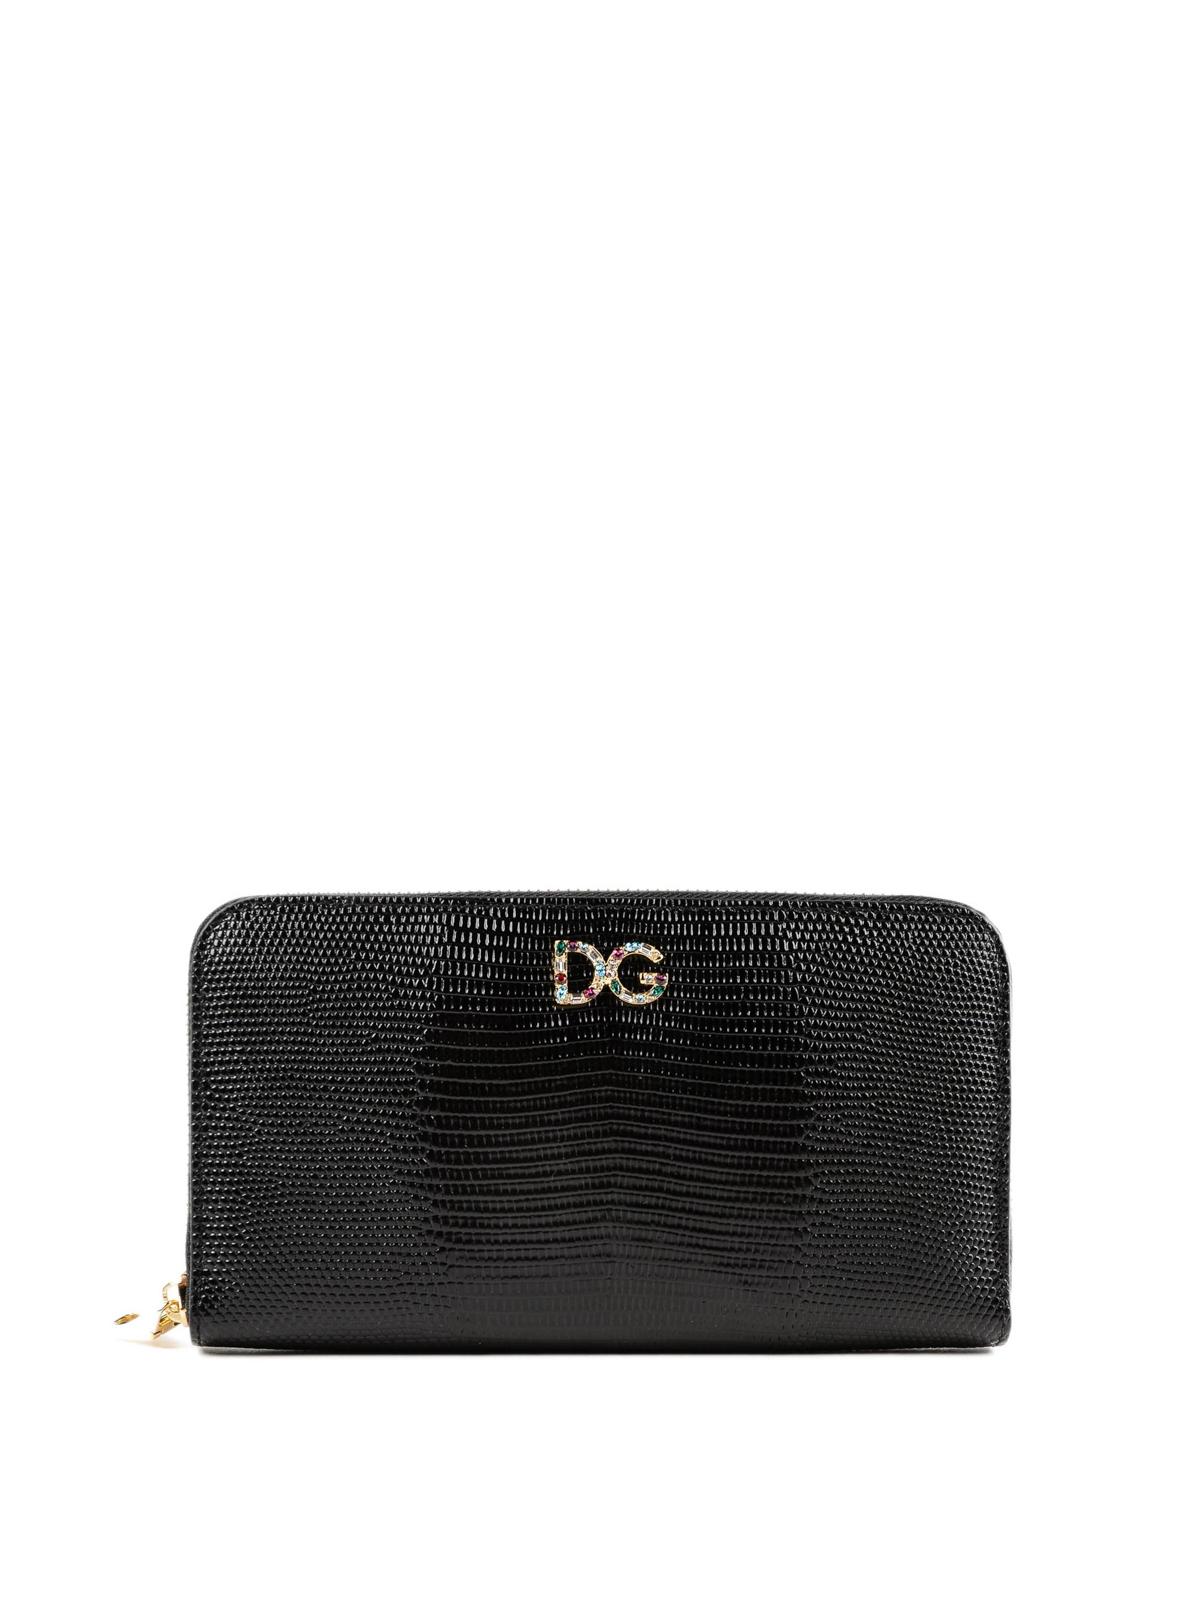 44f4307ebb DOLCE   GABBANA  wallets   purses - Jewel logo black iguana print leather  wallet